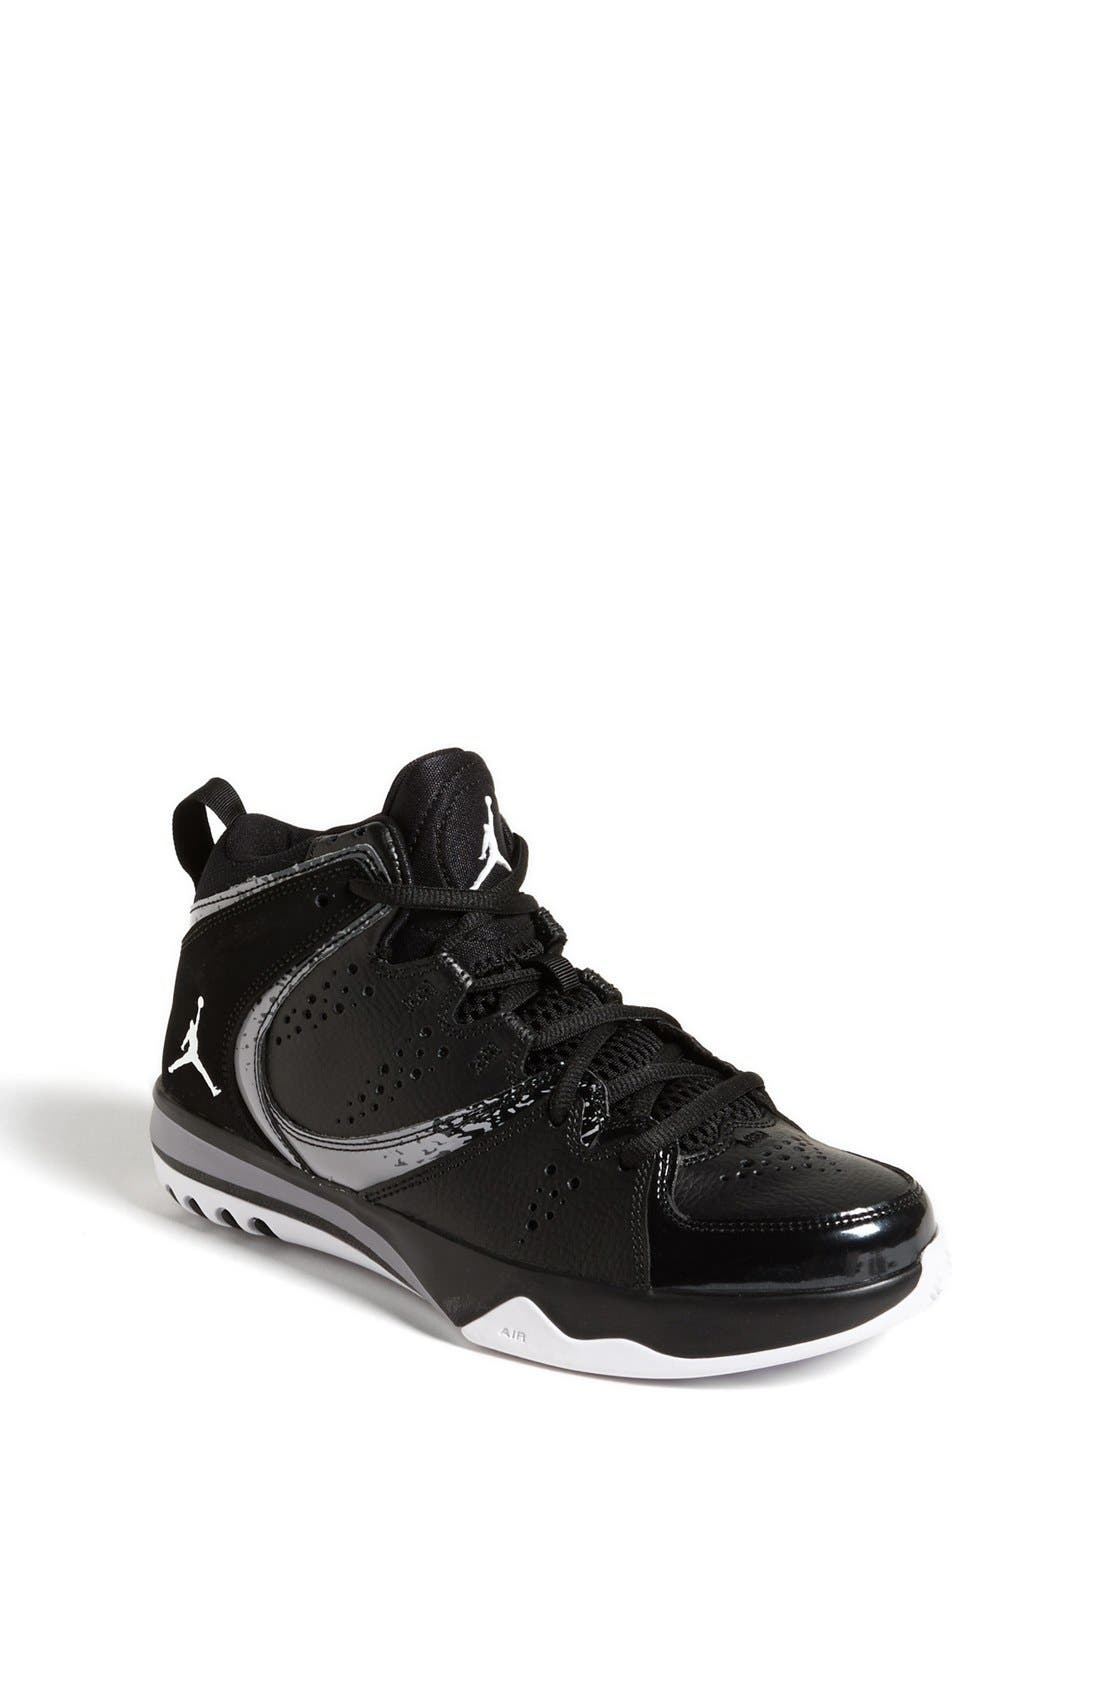 Main Image - Nike 'Jordan Phase 23 2' Sneaker (Toddler & Little Kid)